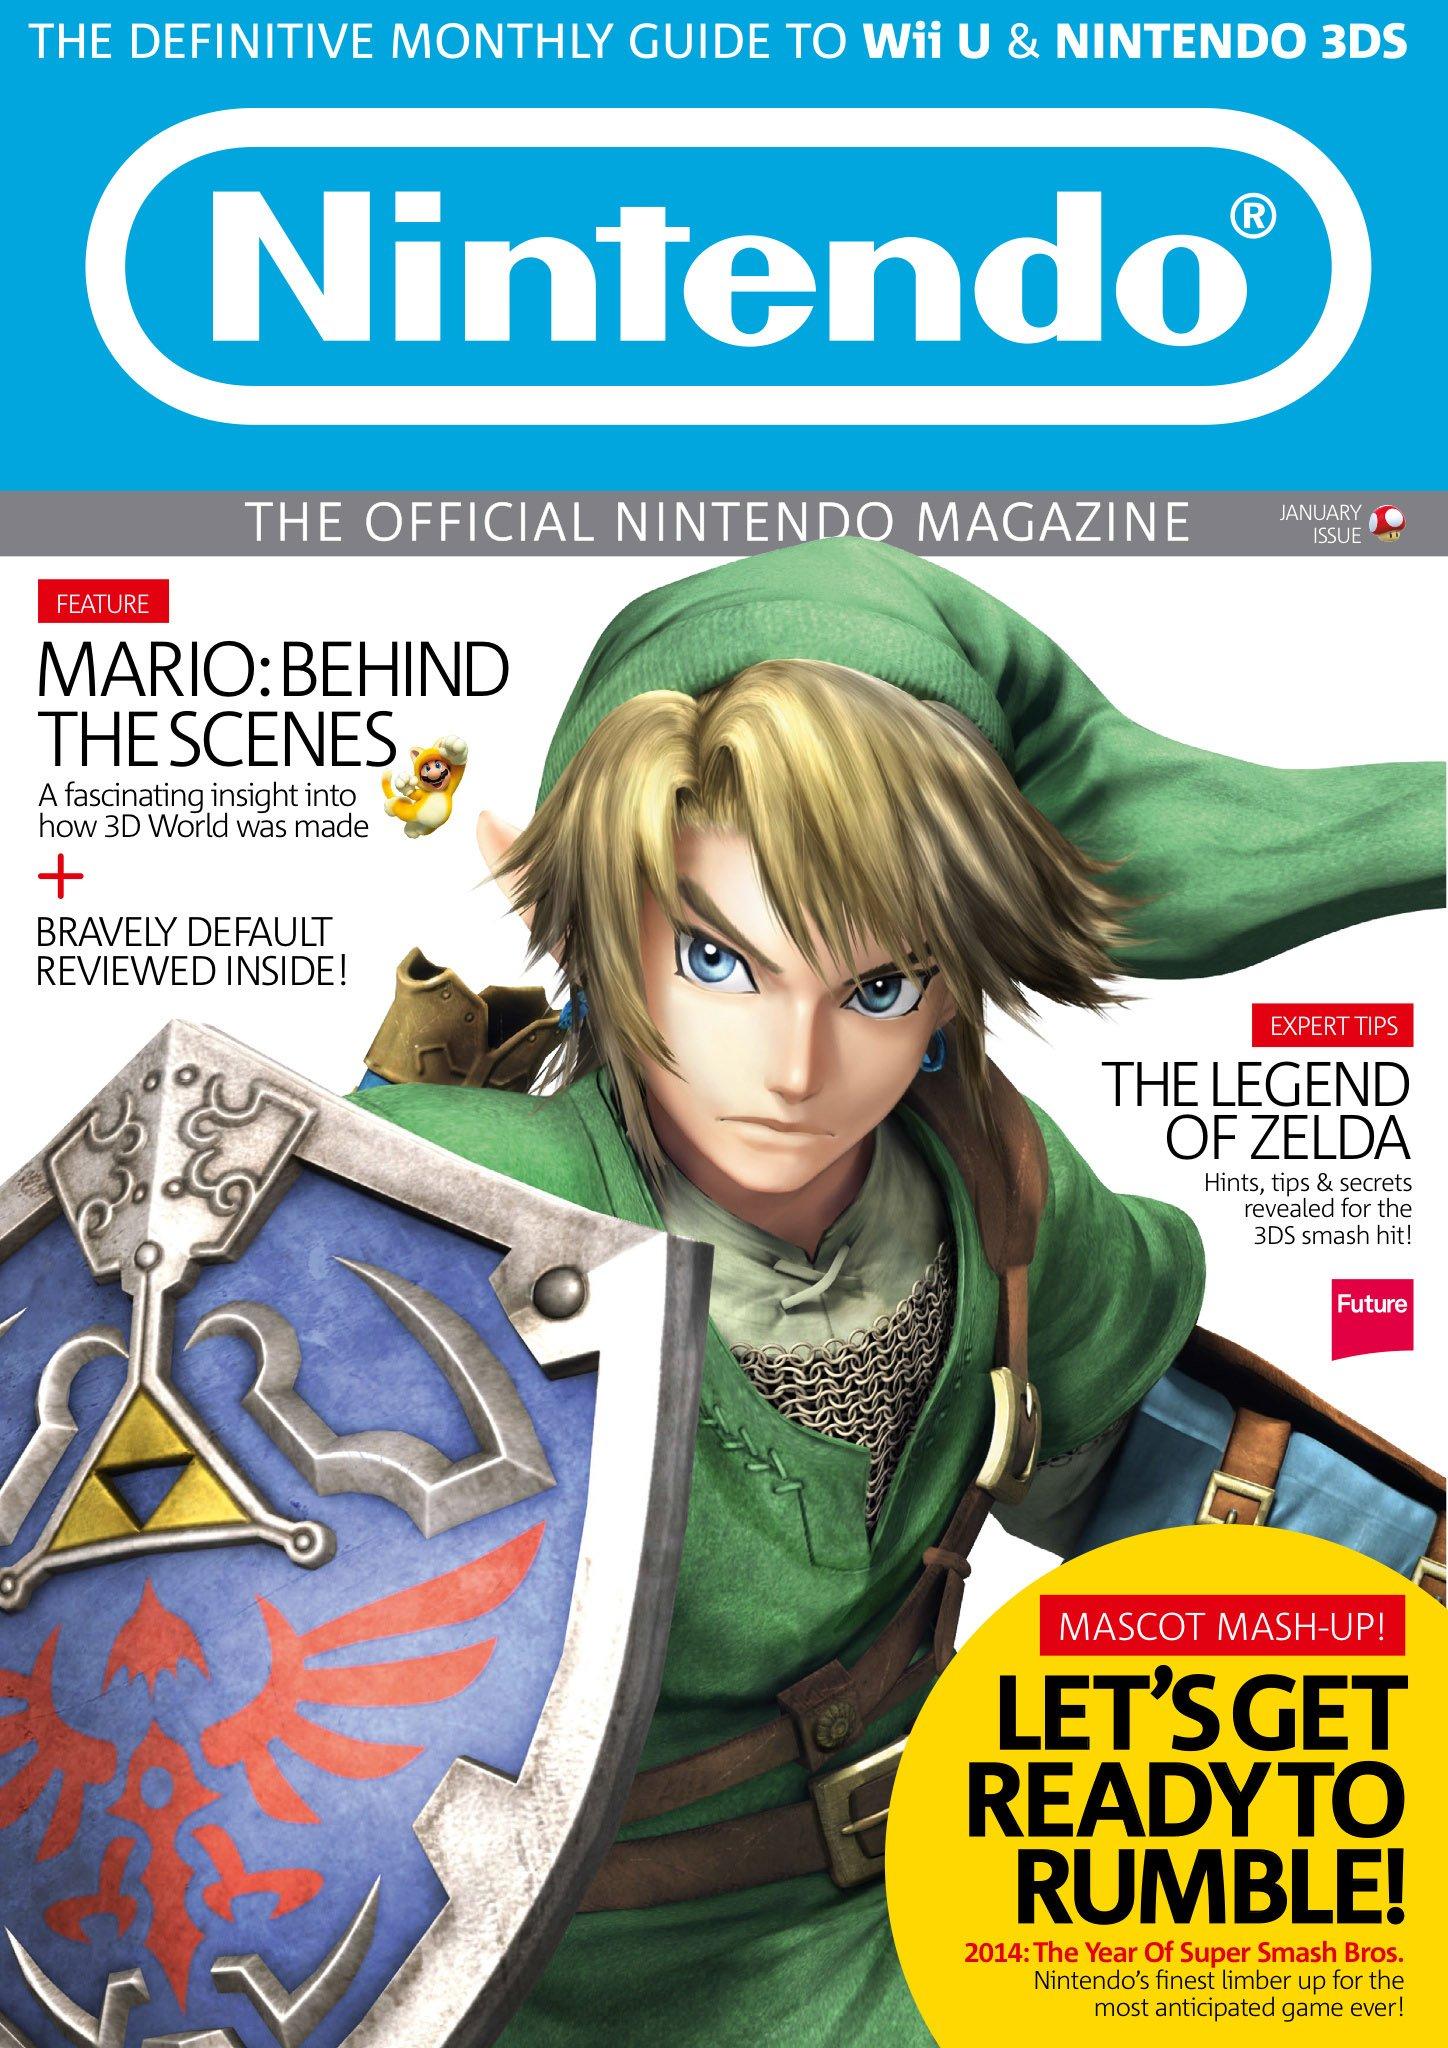 Official Nintendo Magazine 103 (January 2014)